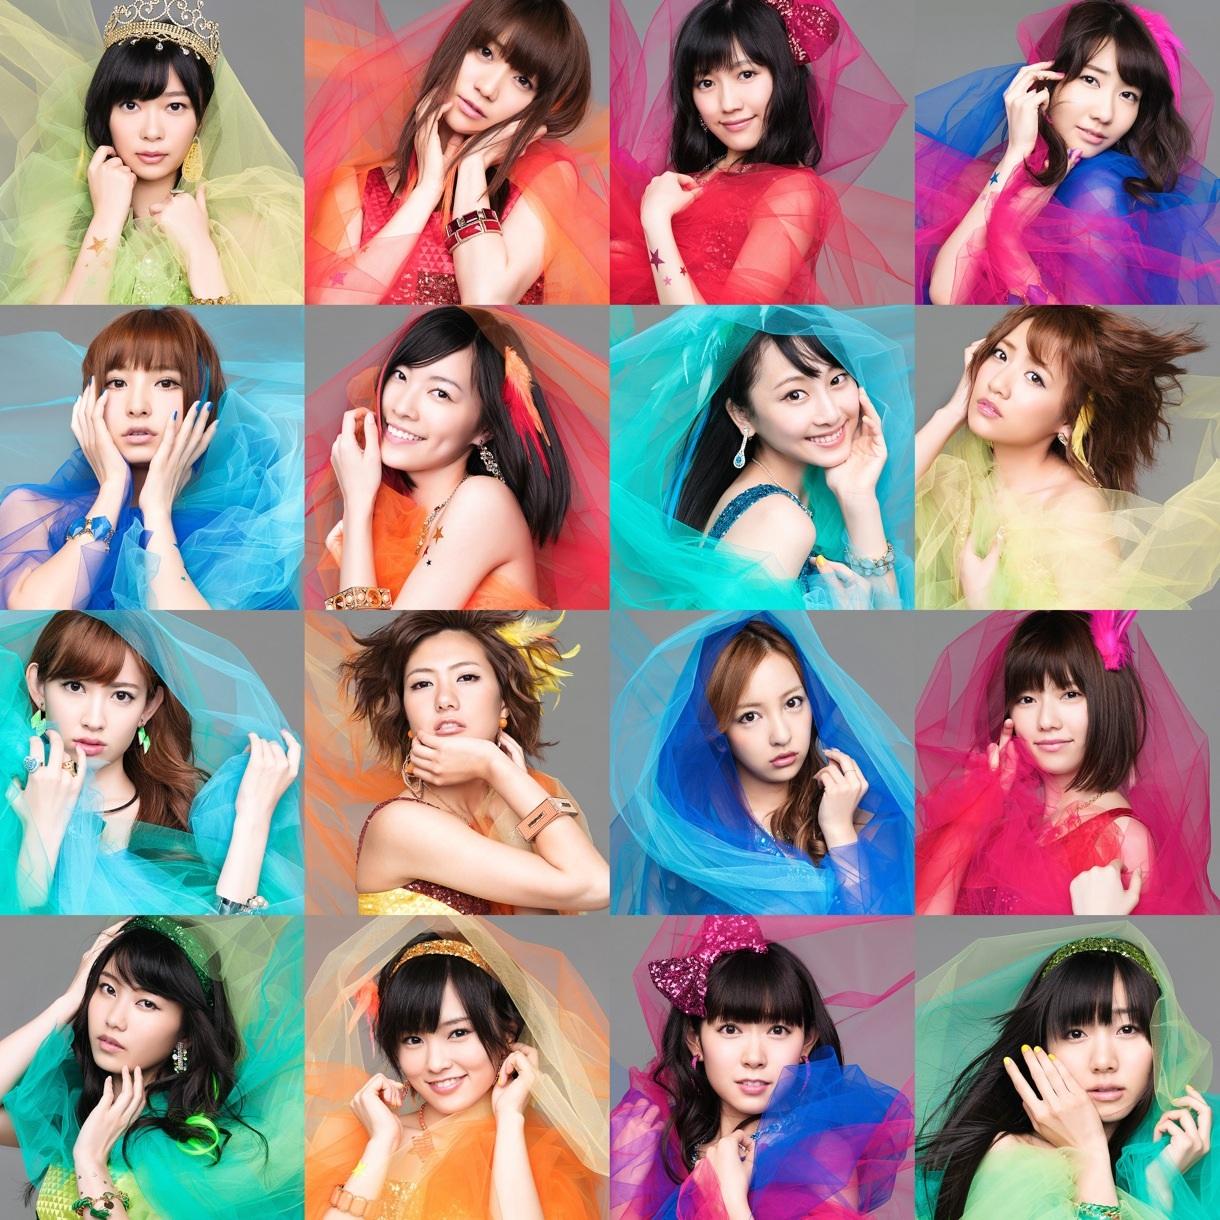 AKB48 - Koi Suru Fortune Cookie Lyrics | MetroLyrics